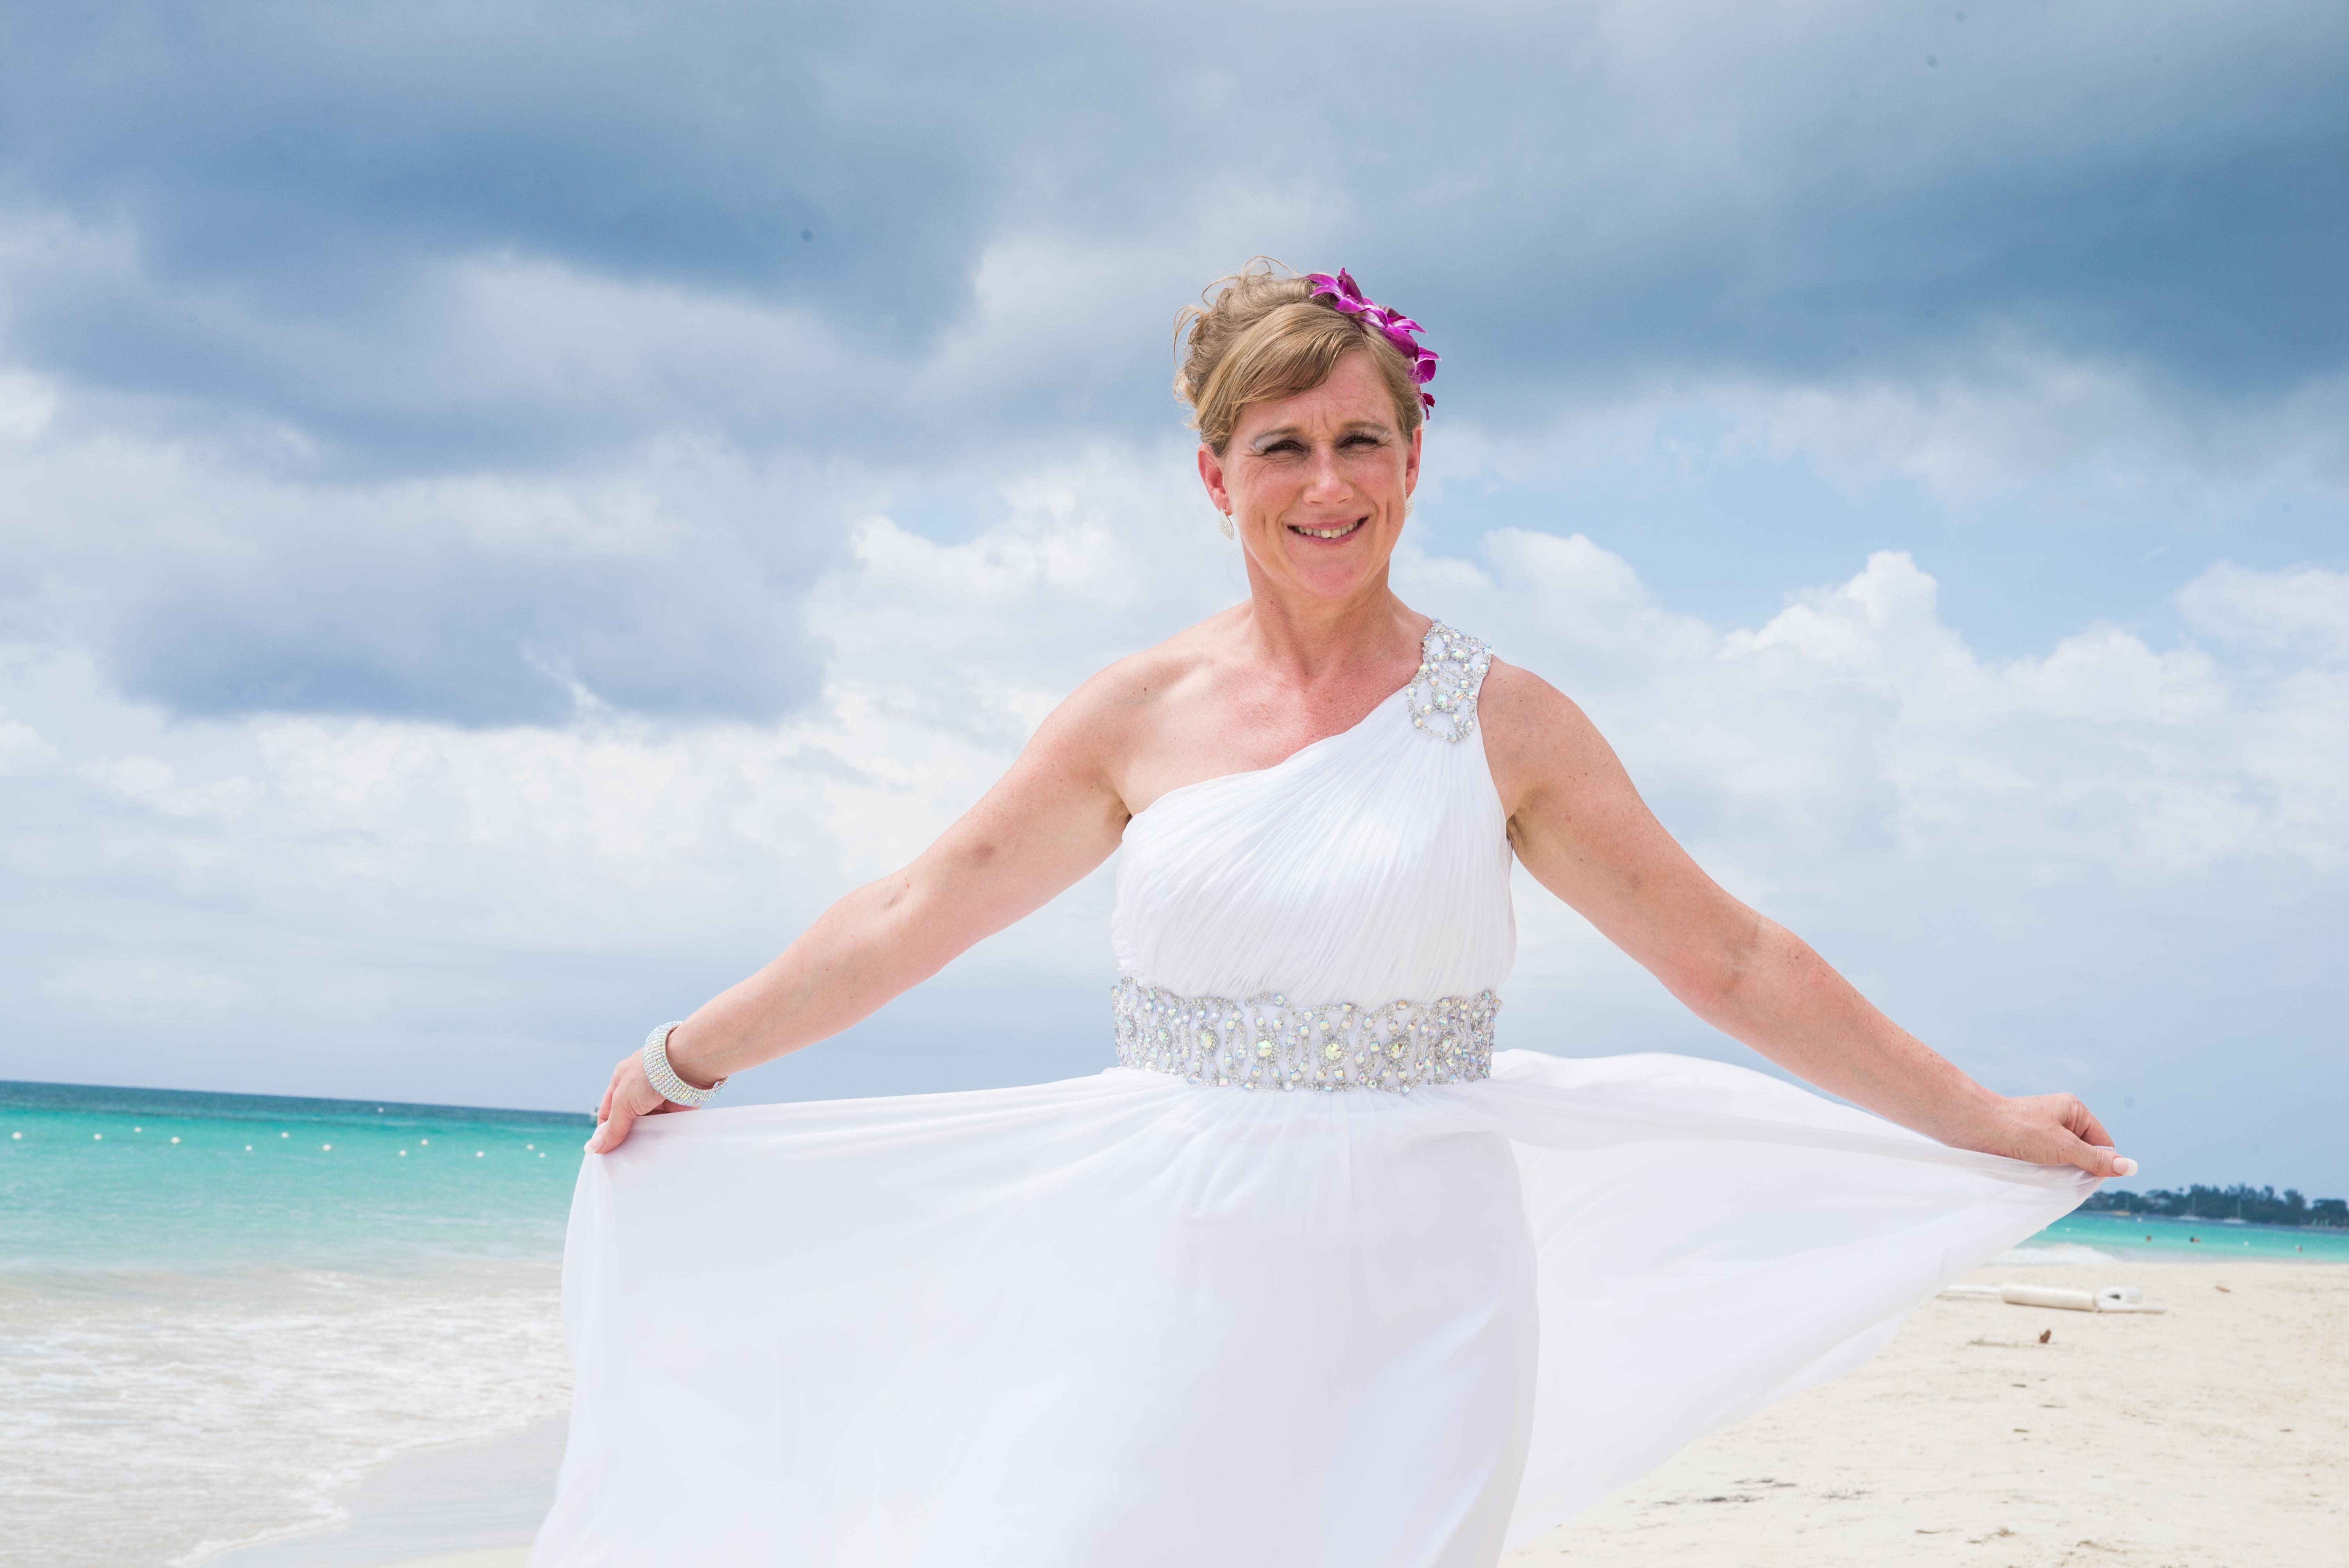 jamaica wedding photography photographers message board forum jamaican wedding dresses Jamaican wedding photography cinematic vision